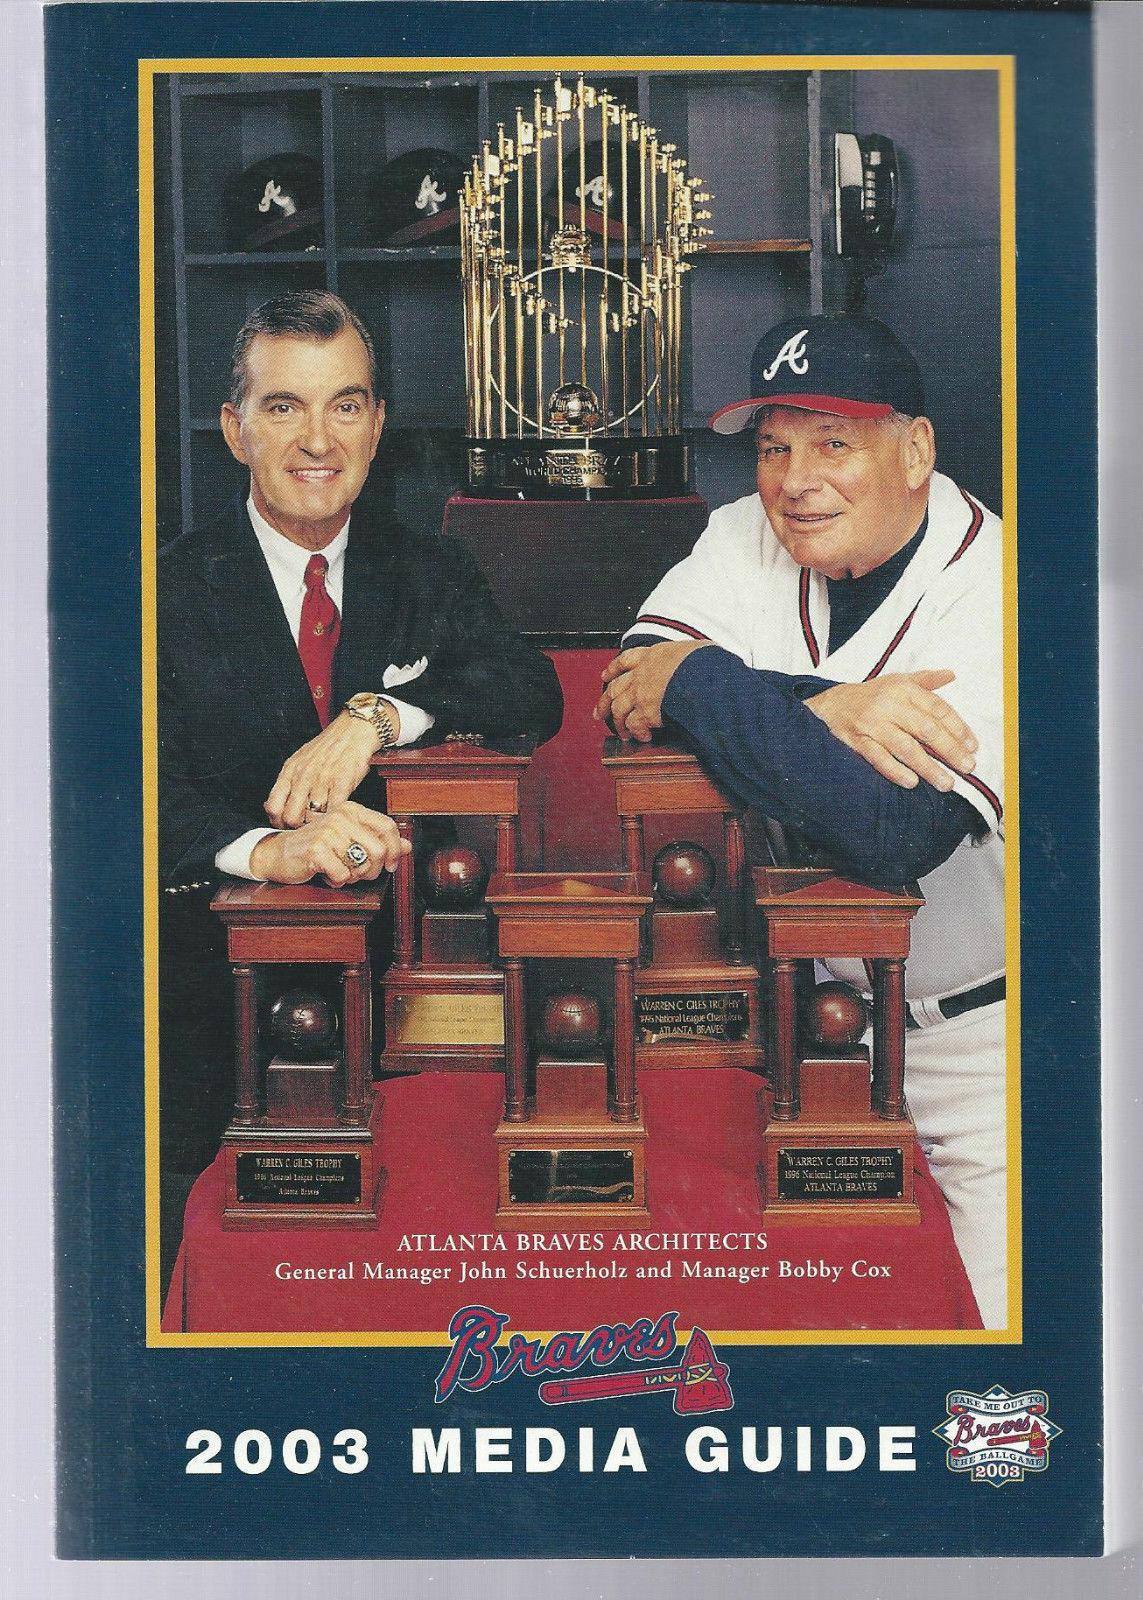 2003 Atlanta Braves Baseball MLB Media Guide - Annual Player Information